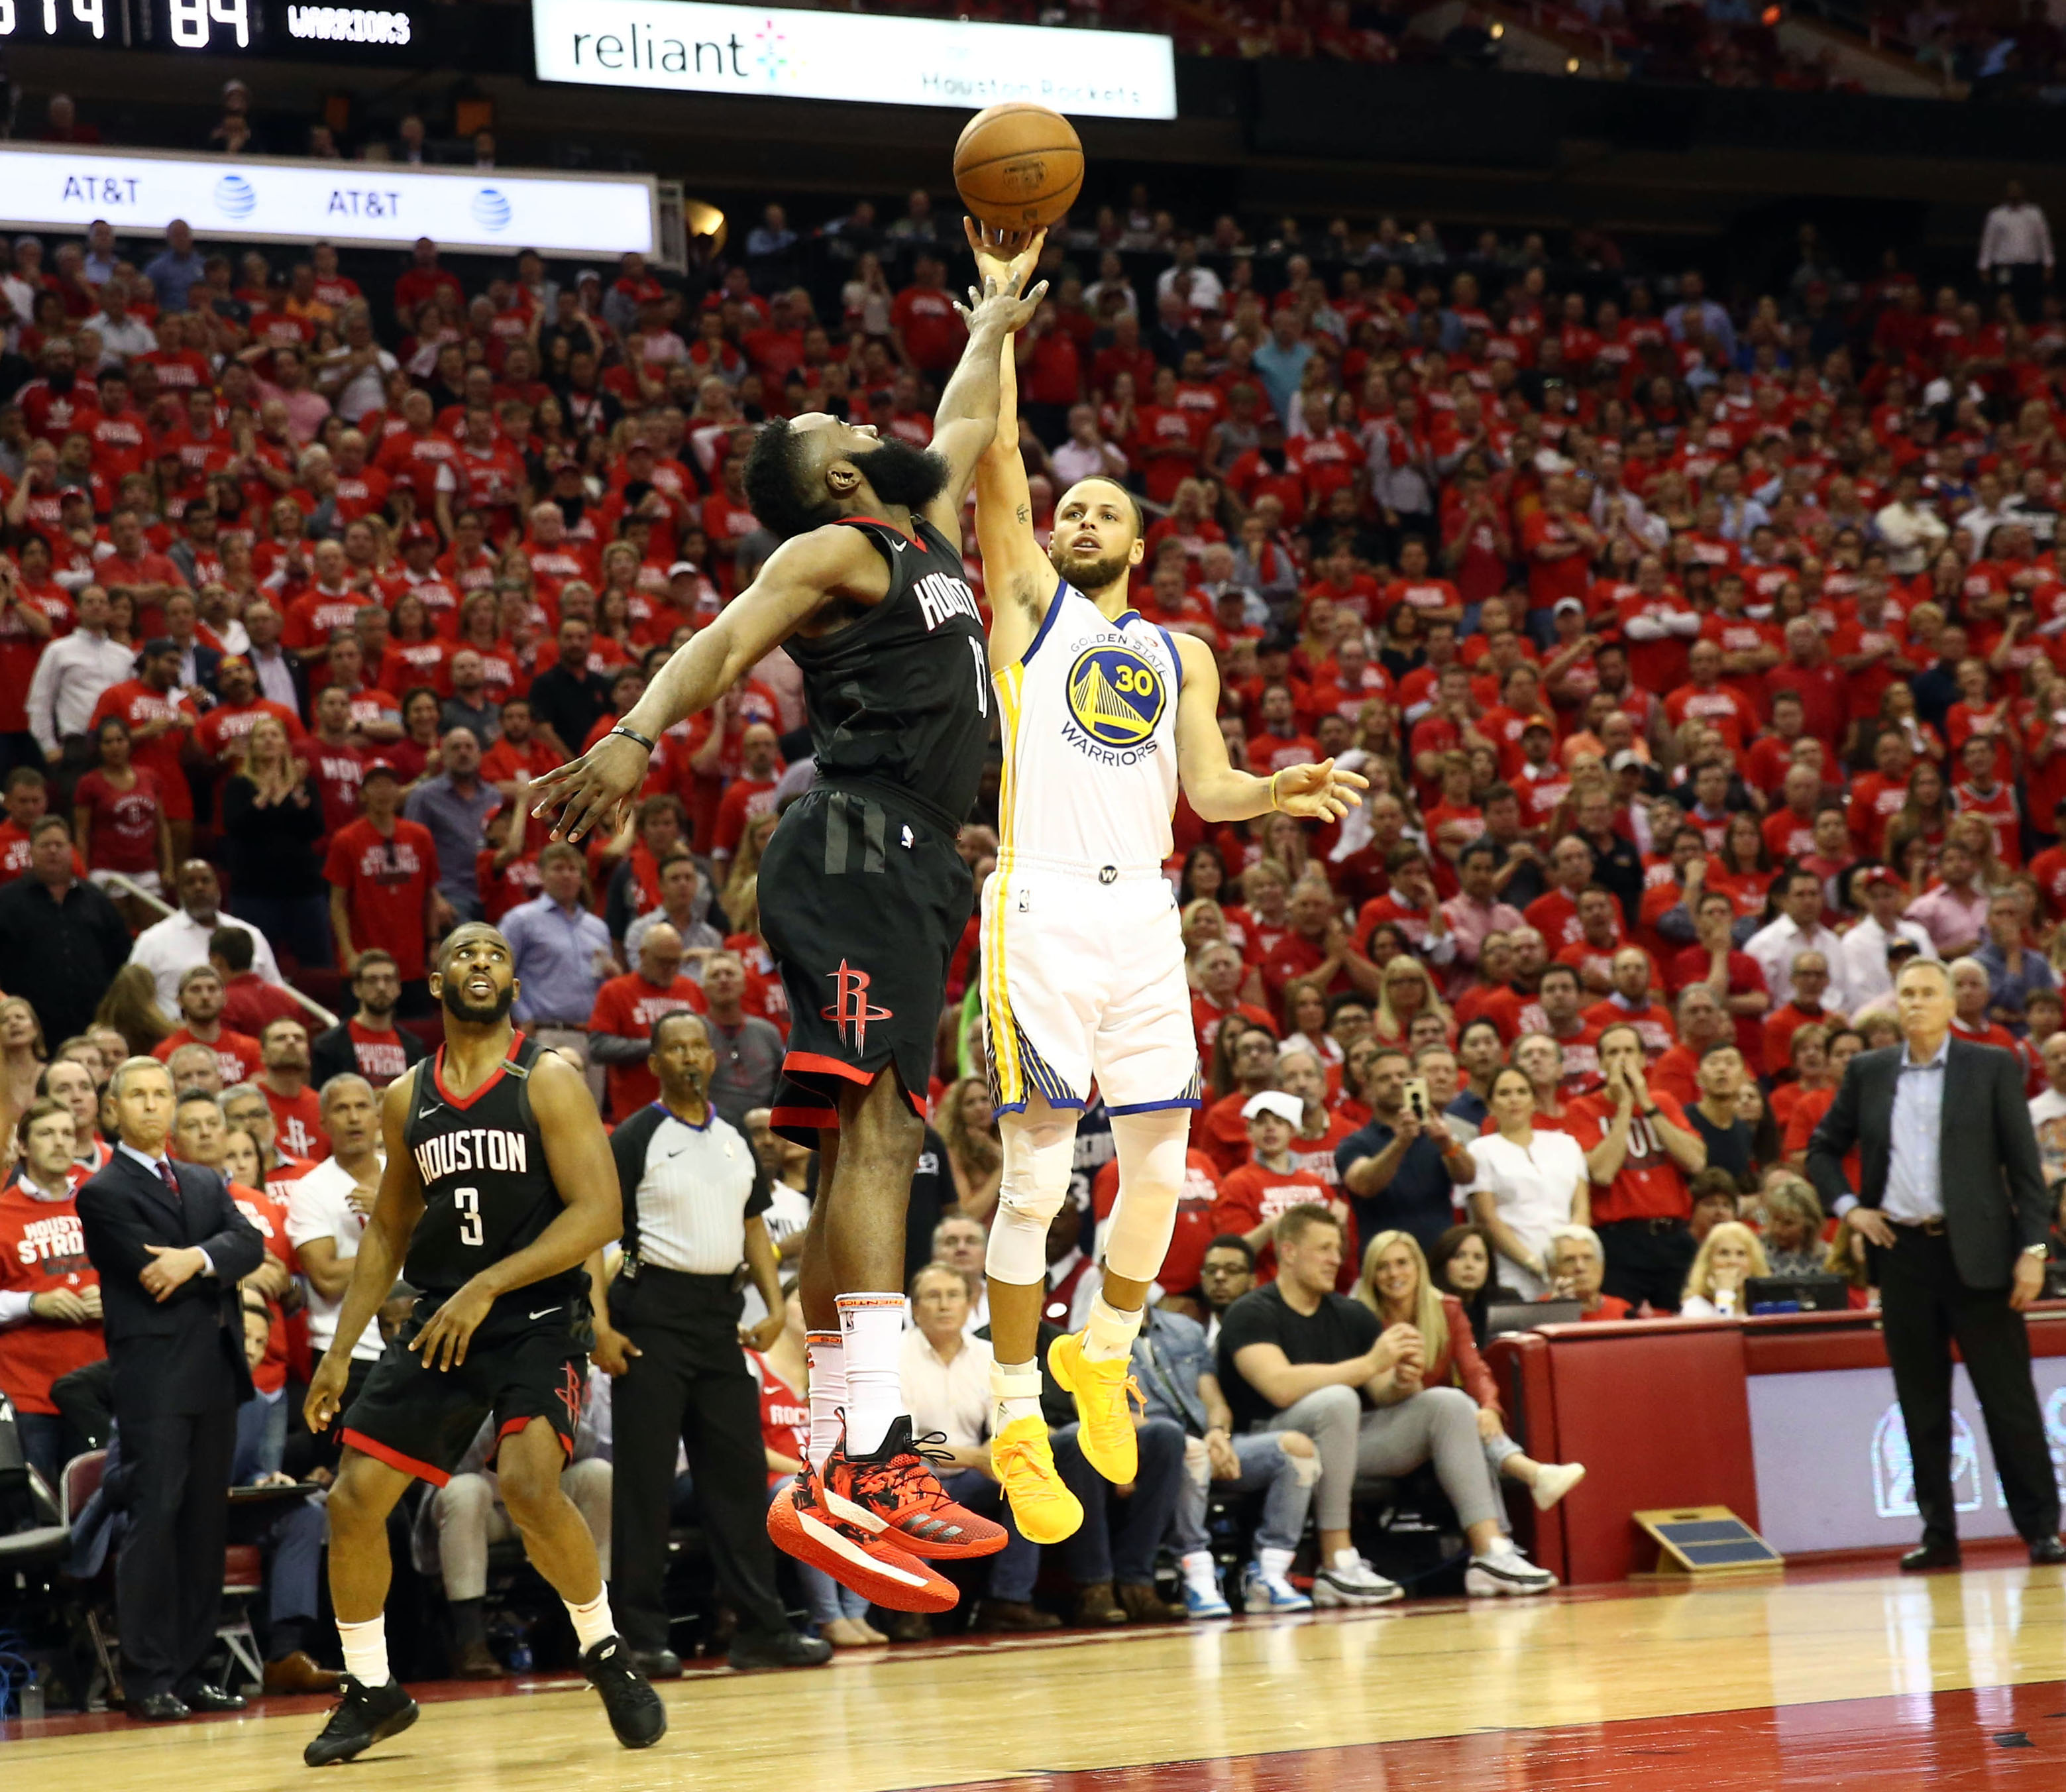 Rockets Vs Warriors Game 7 Where: The Dream Shake, A Houston Rockets Community